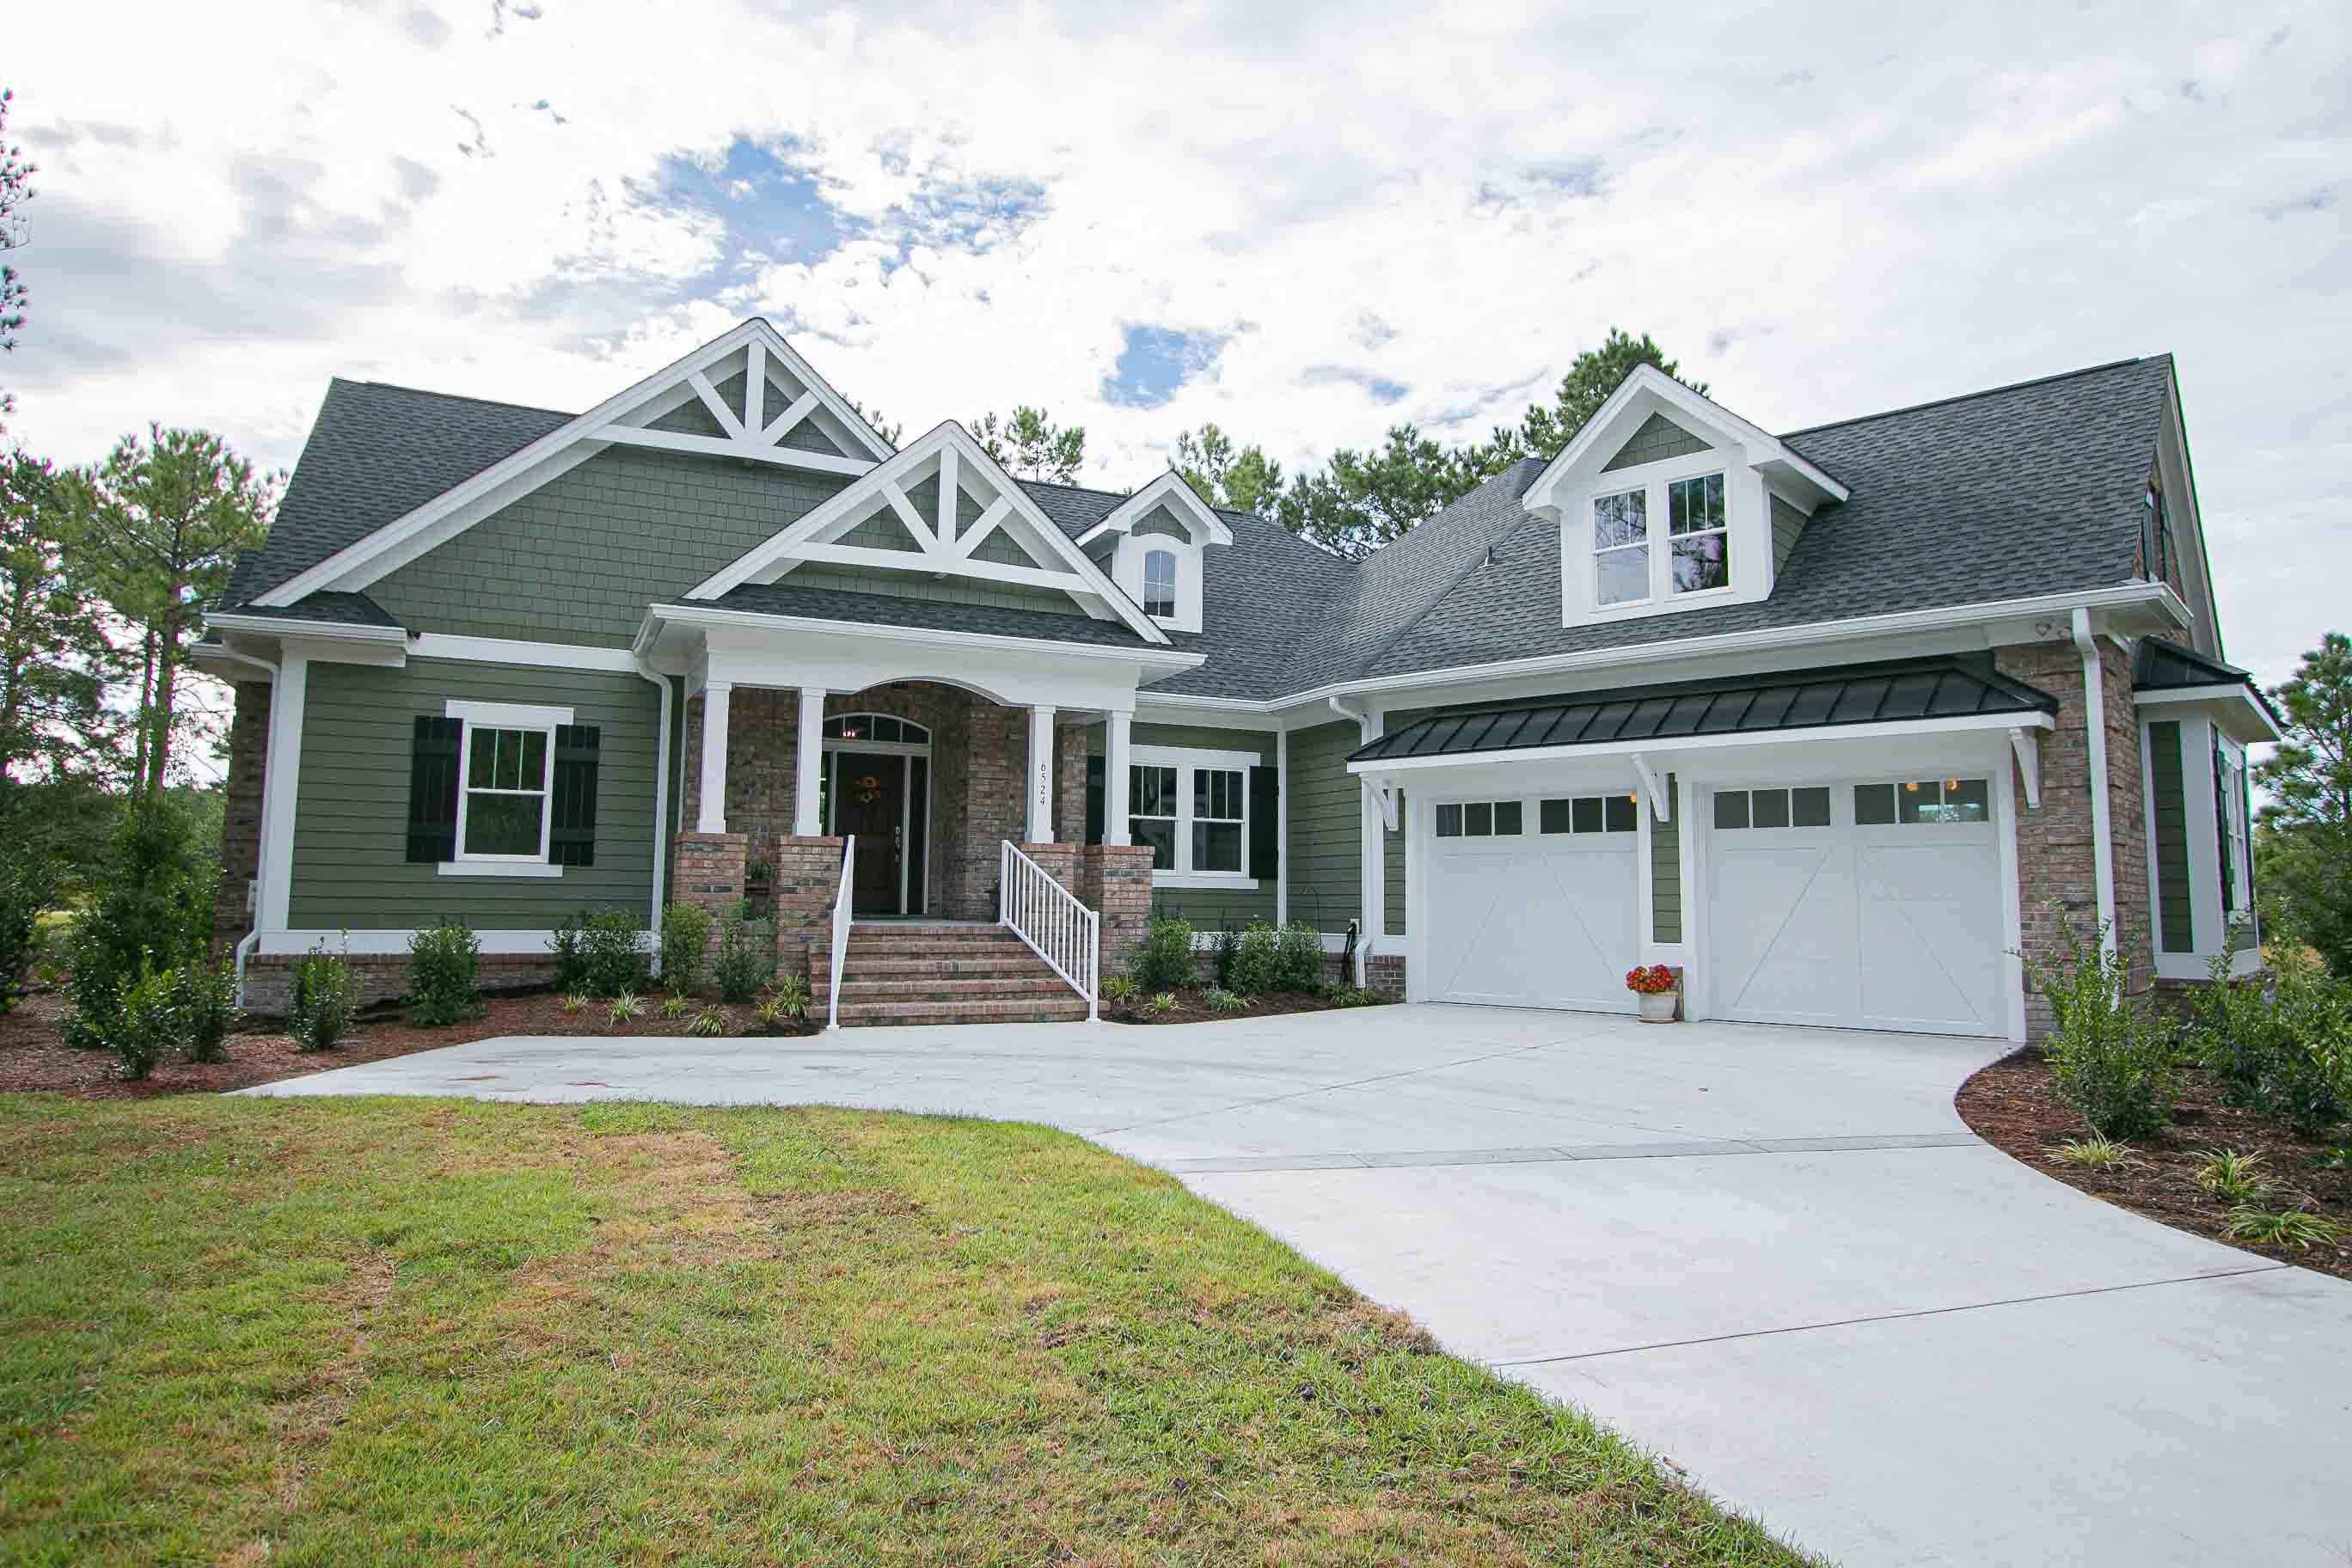 Custom Ocean Ridge Home by QRI Construction